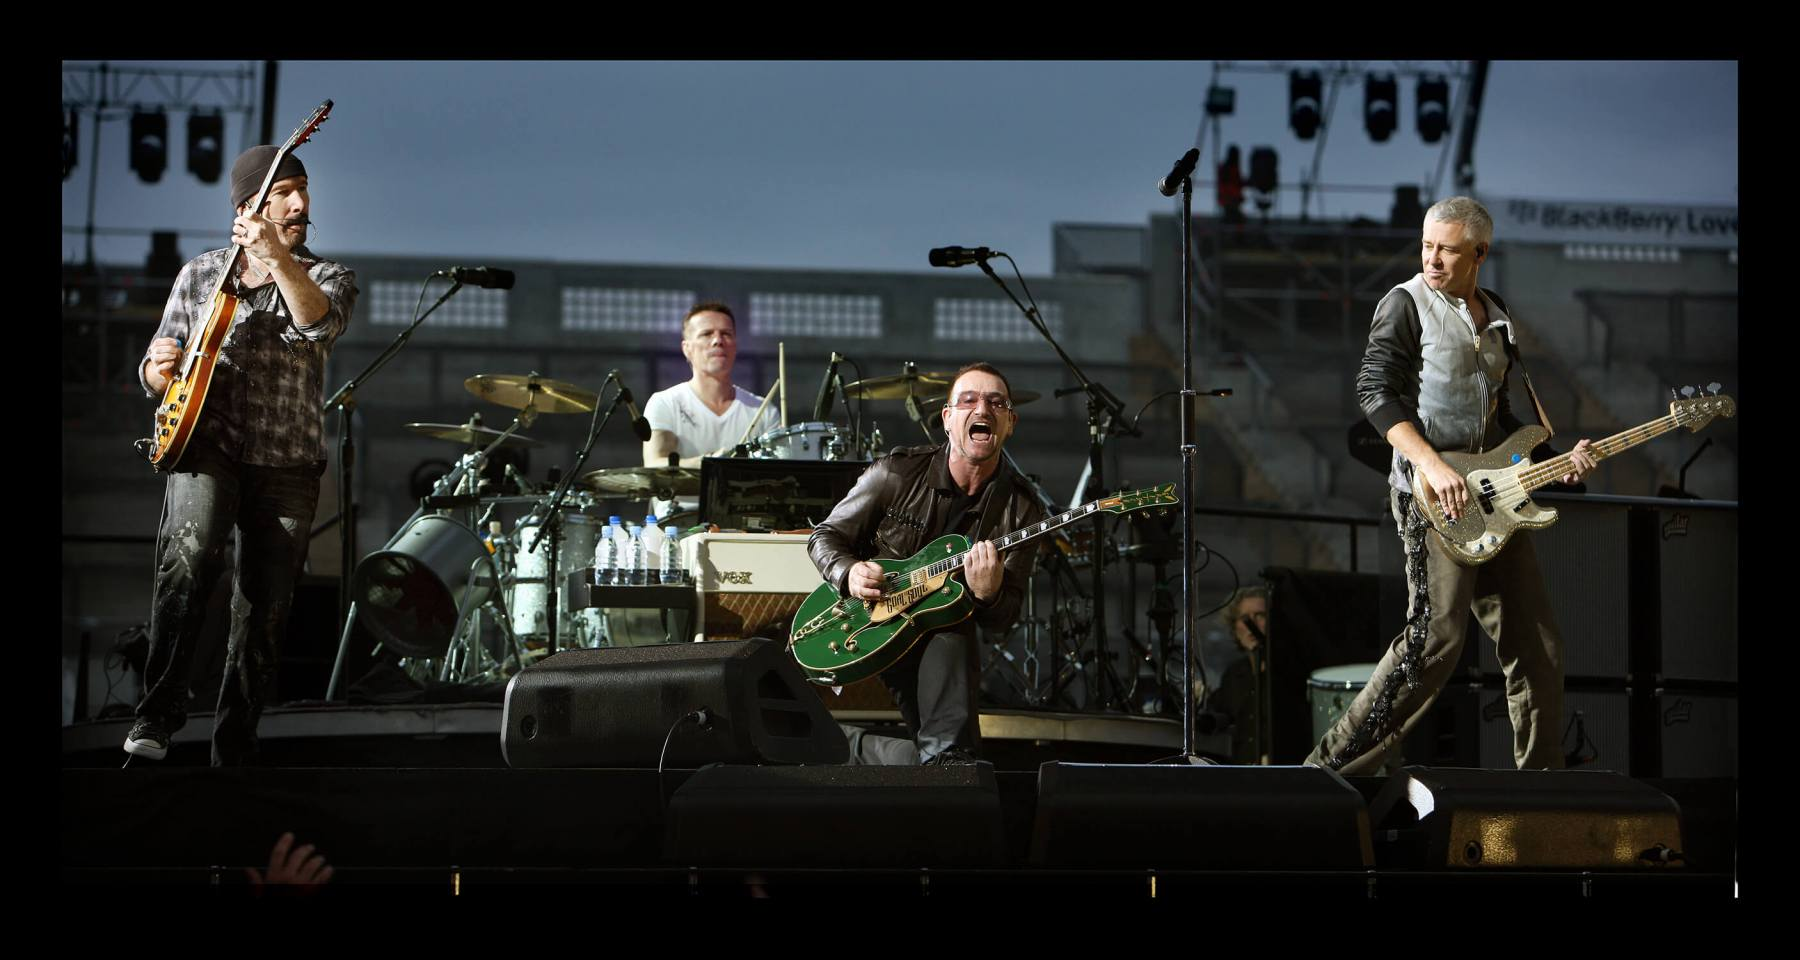 U2-live at Croke Park